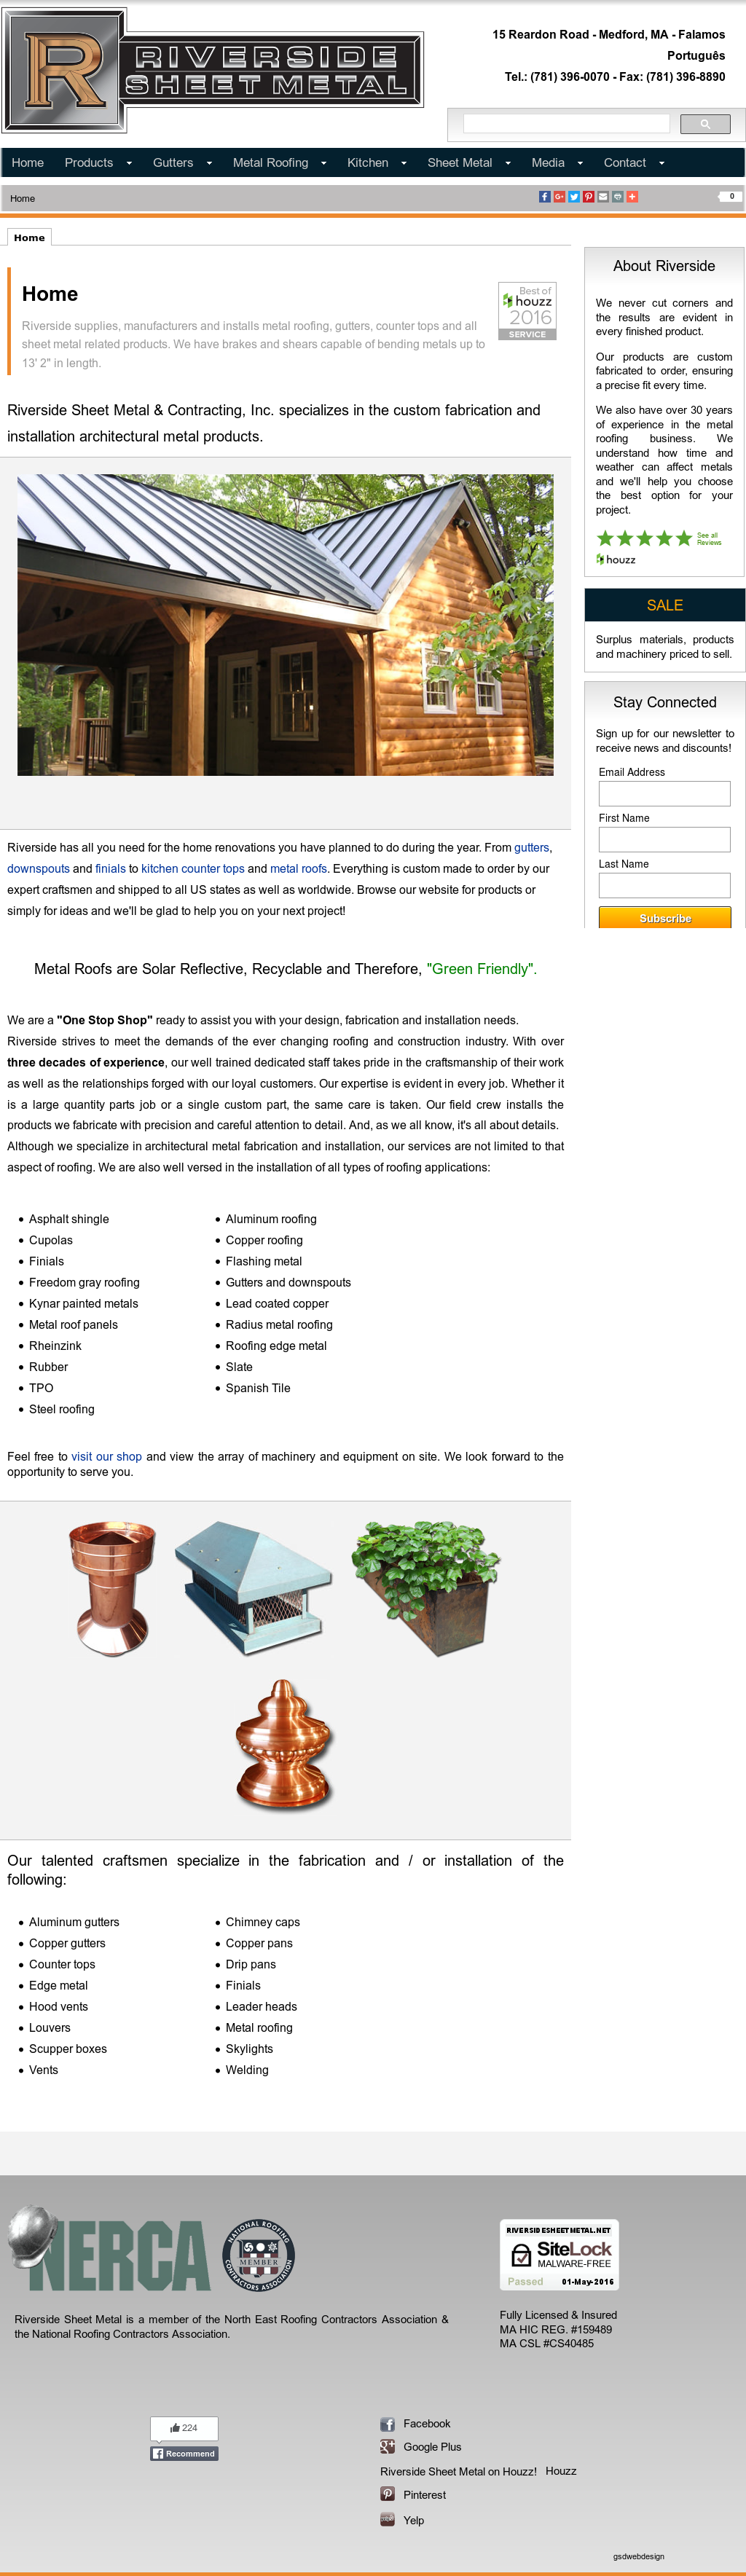 Riversidesheetmetal Competitors Revenue And Employees Owler